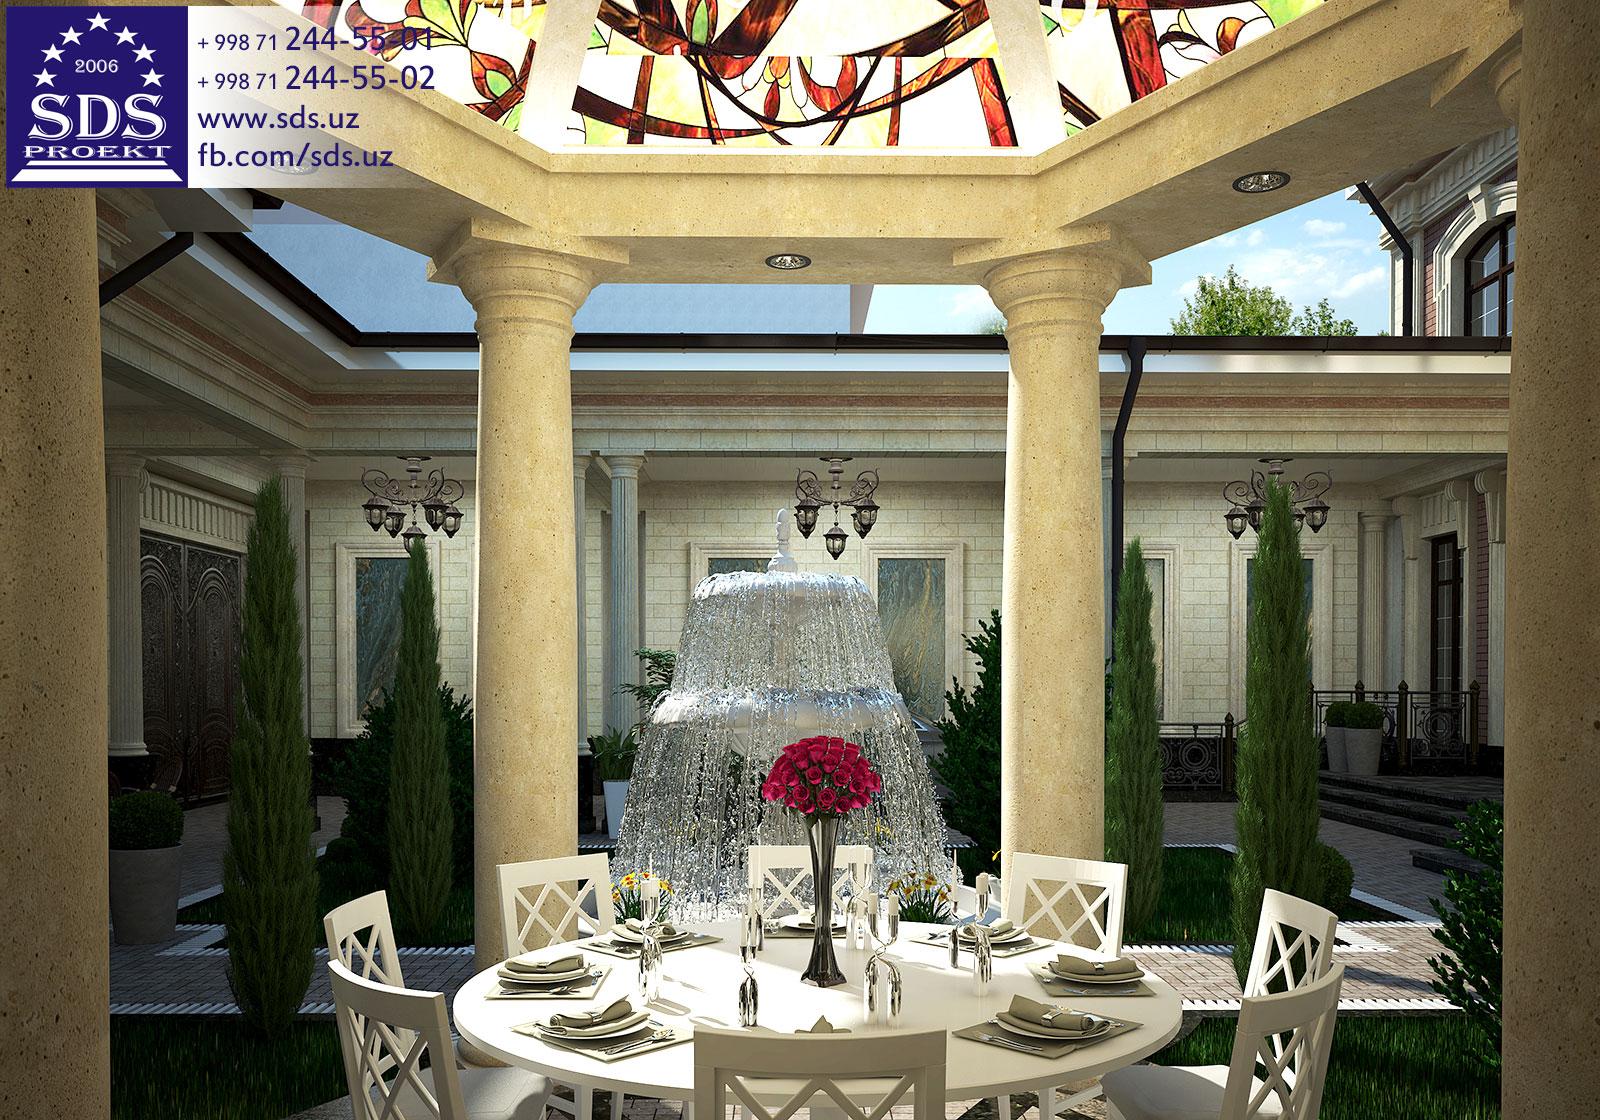 Проект частного дома в Алмазарском районе, г Ташкента